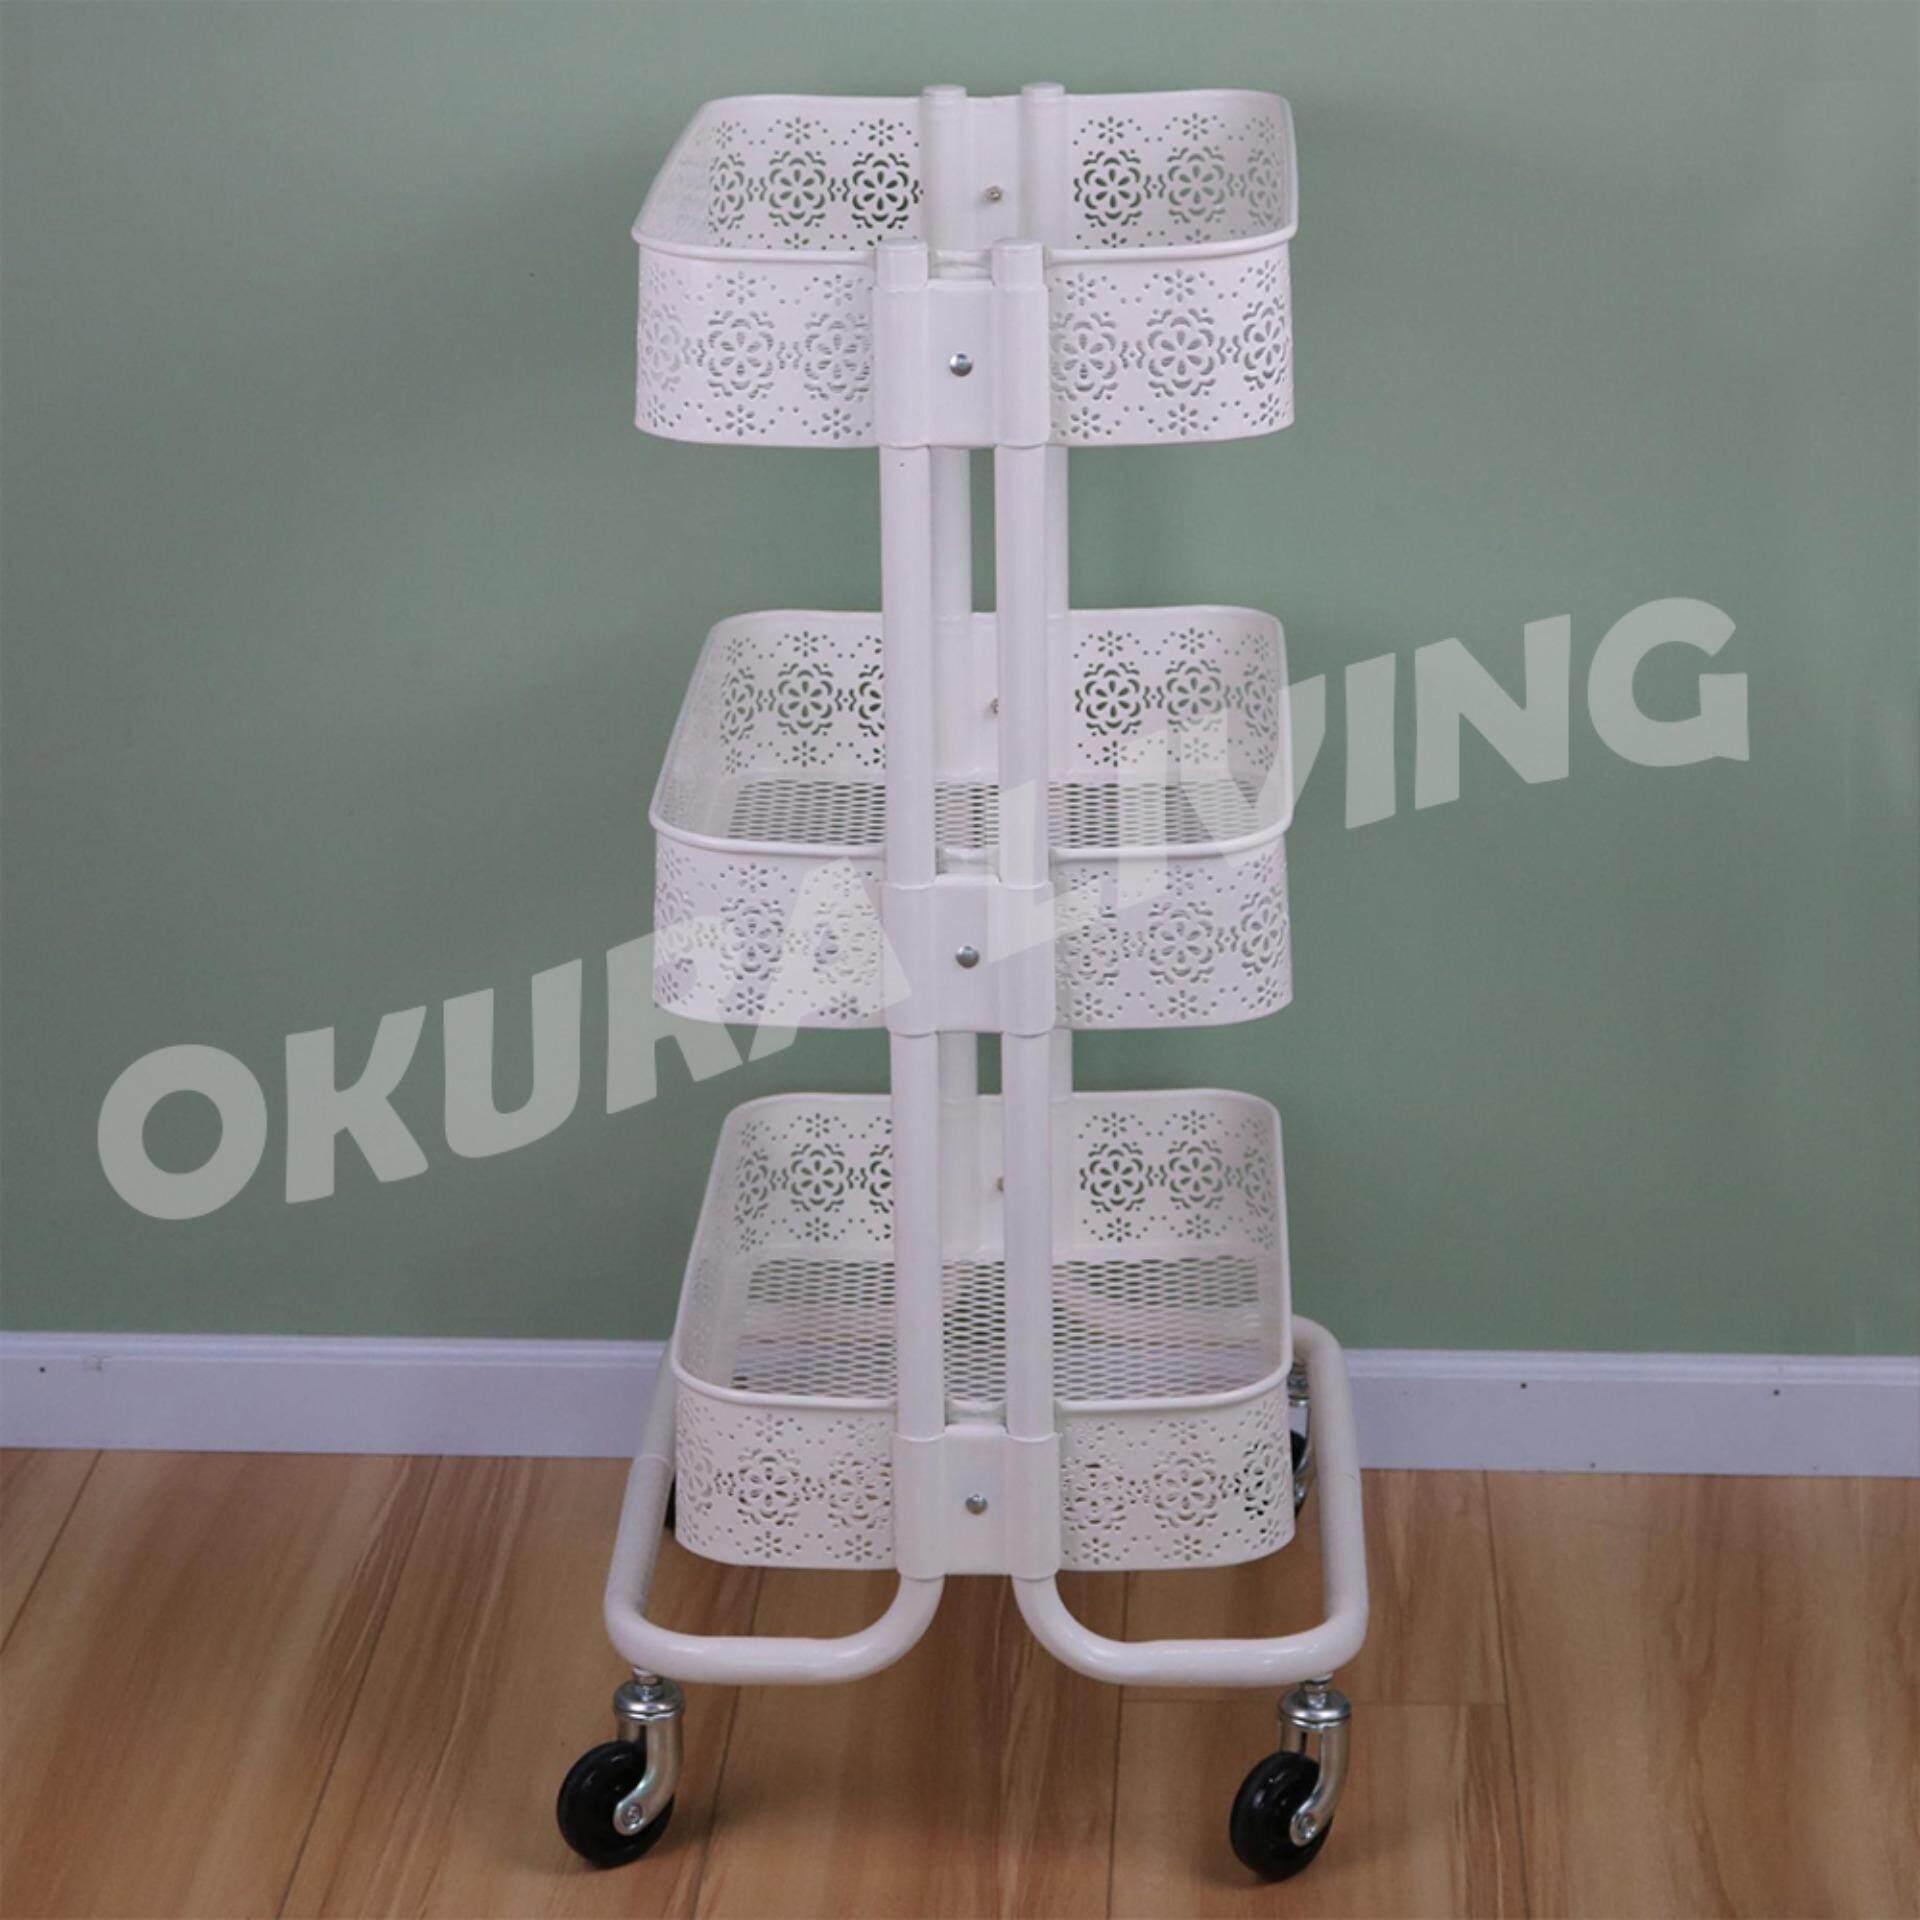 OKURA 3 Tier Trolley with Flower Craving Multi-Function Storage Organization